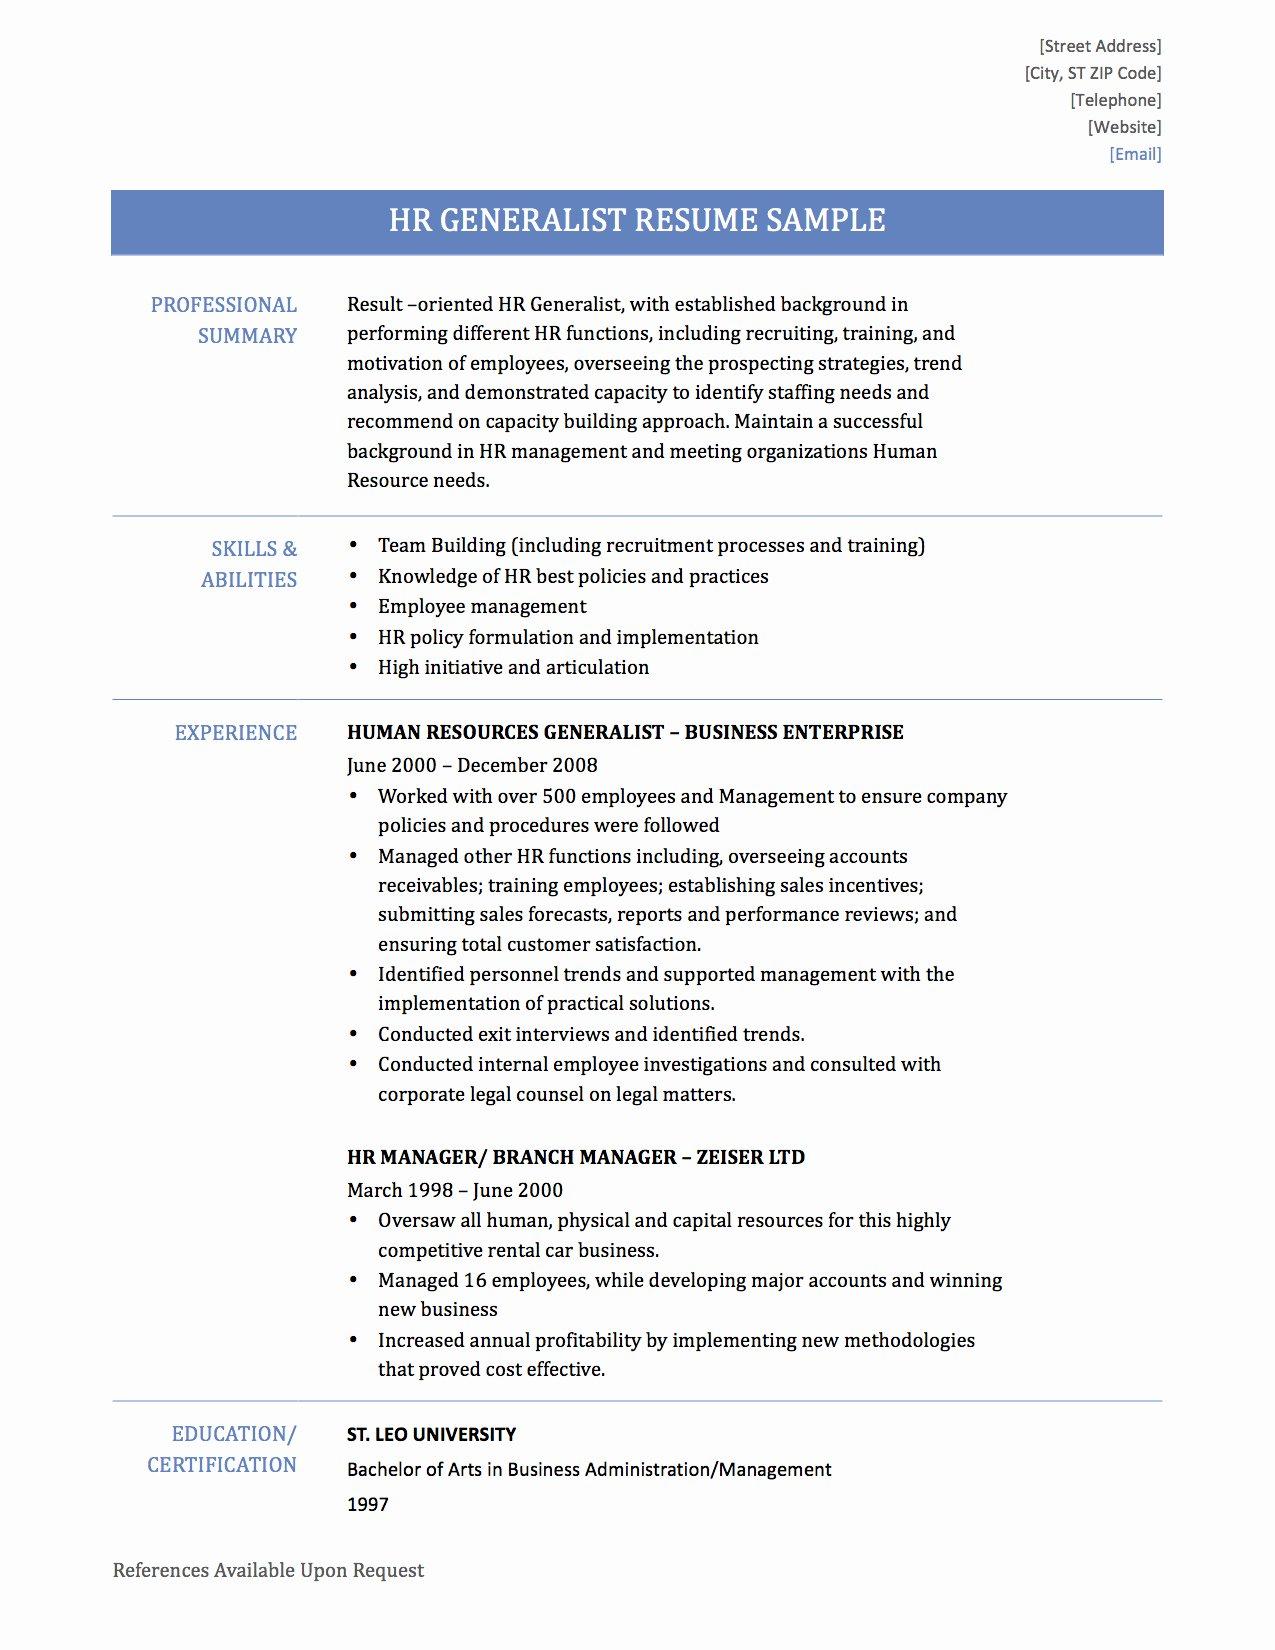 Human Resources Generalist Resume Resume Ideas